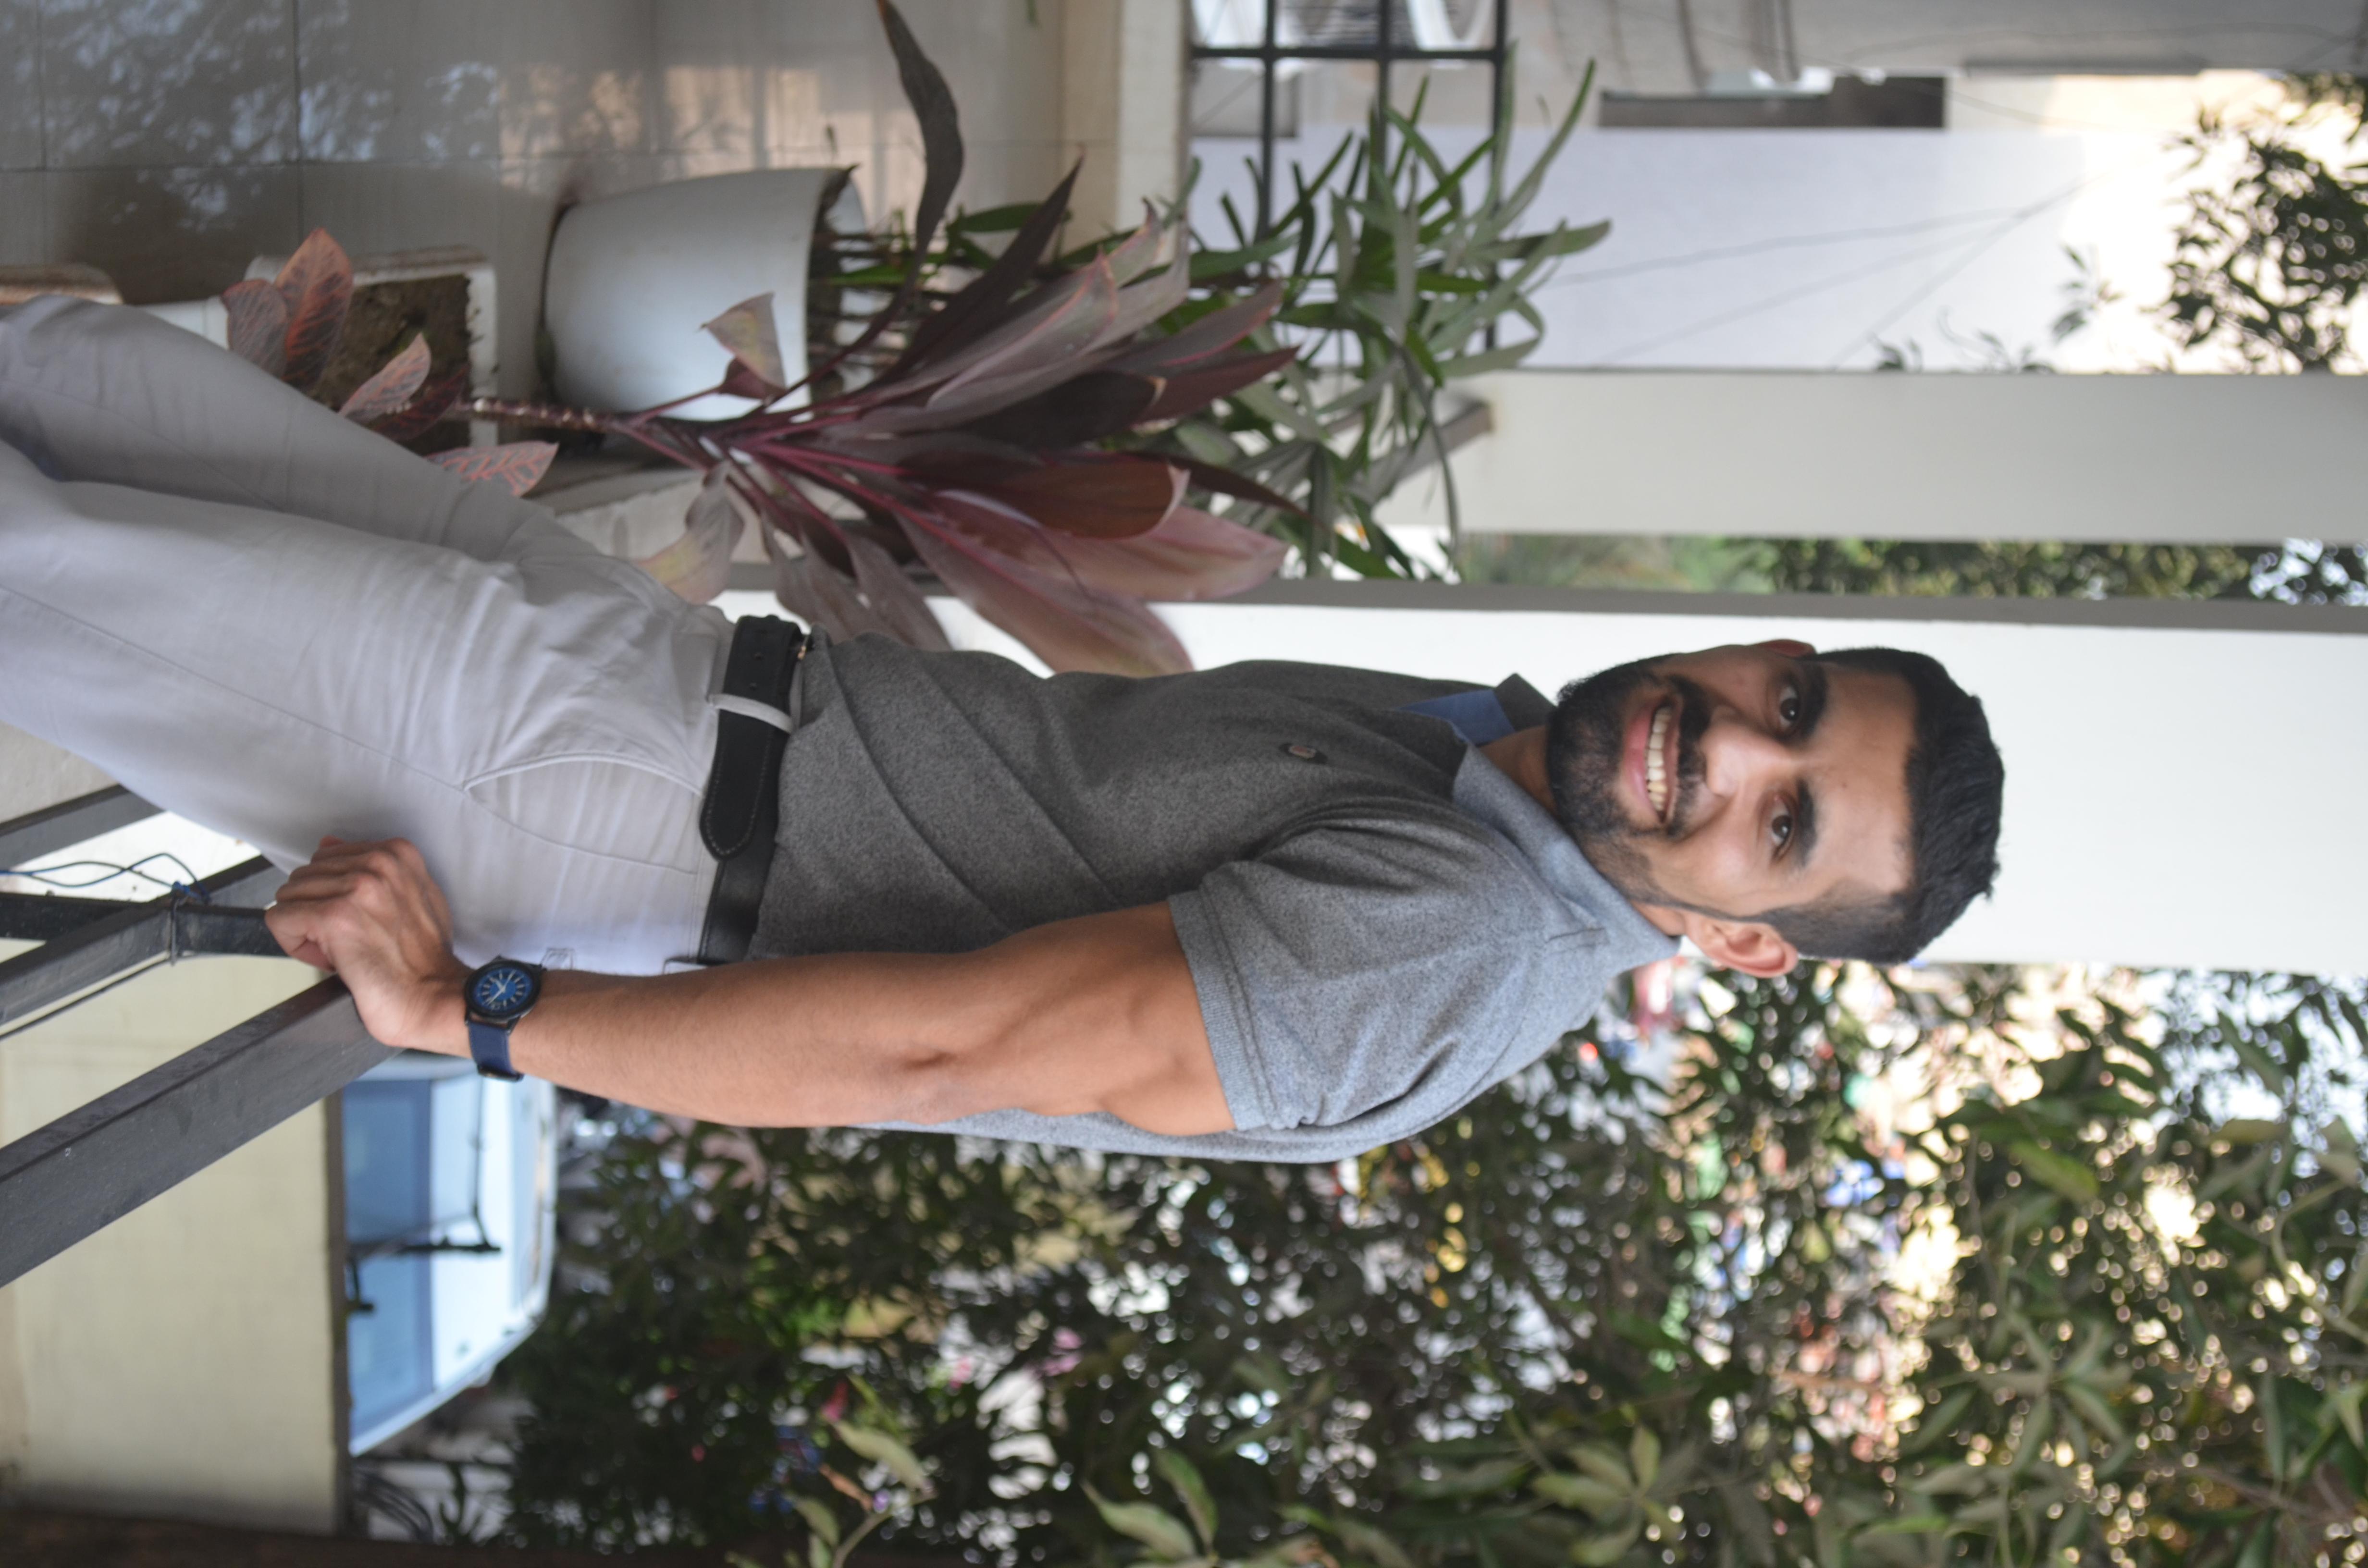 Lavesh bhagtani